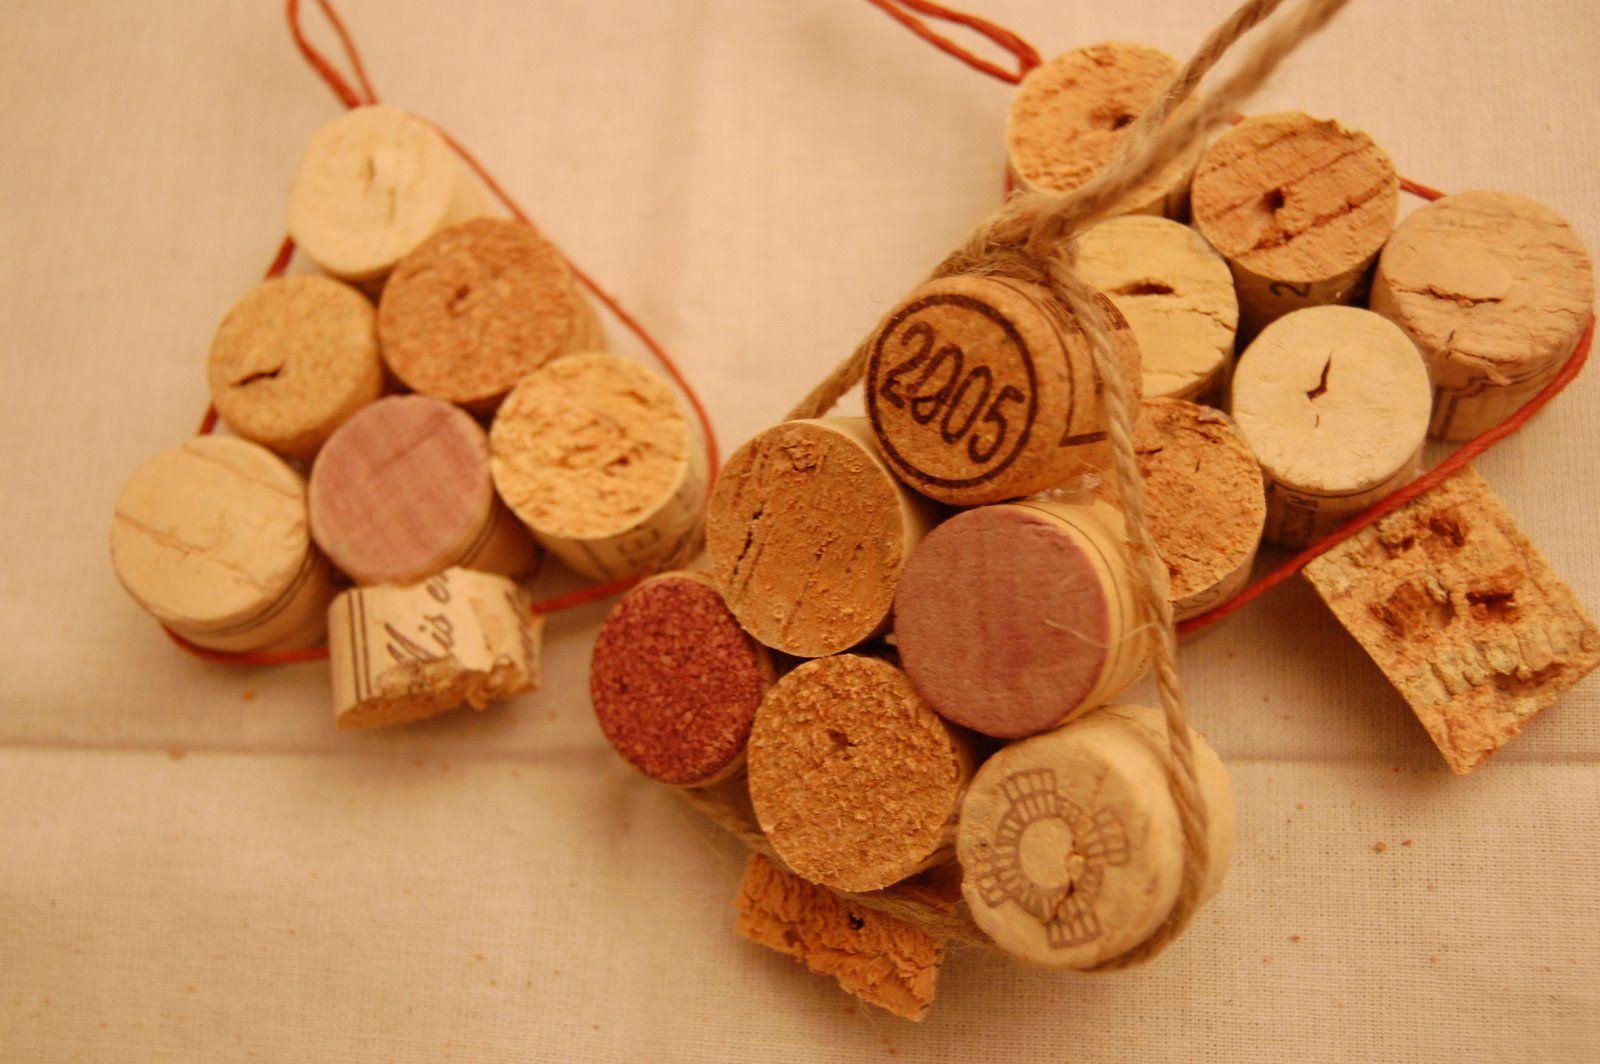 Cork christmas decorations - Wine Cork Ornaments Christmas Decorations